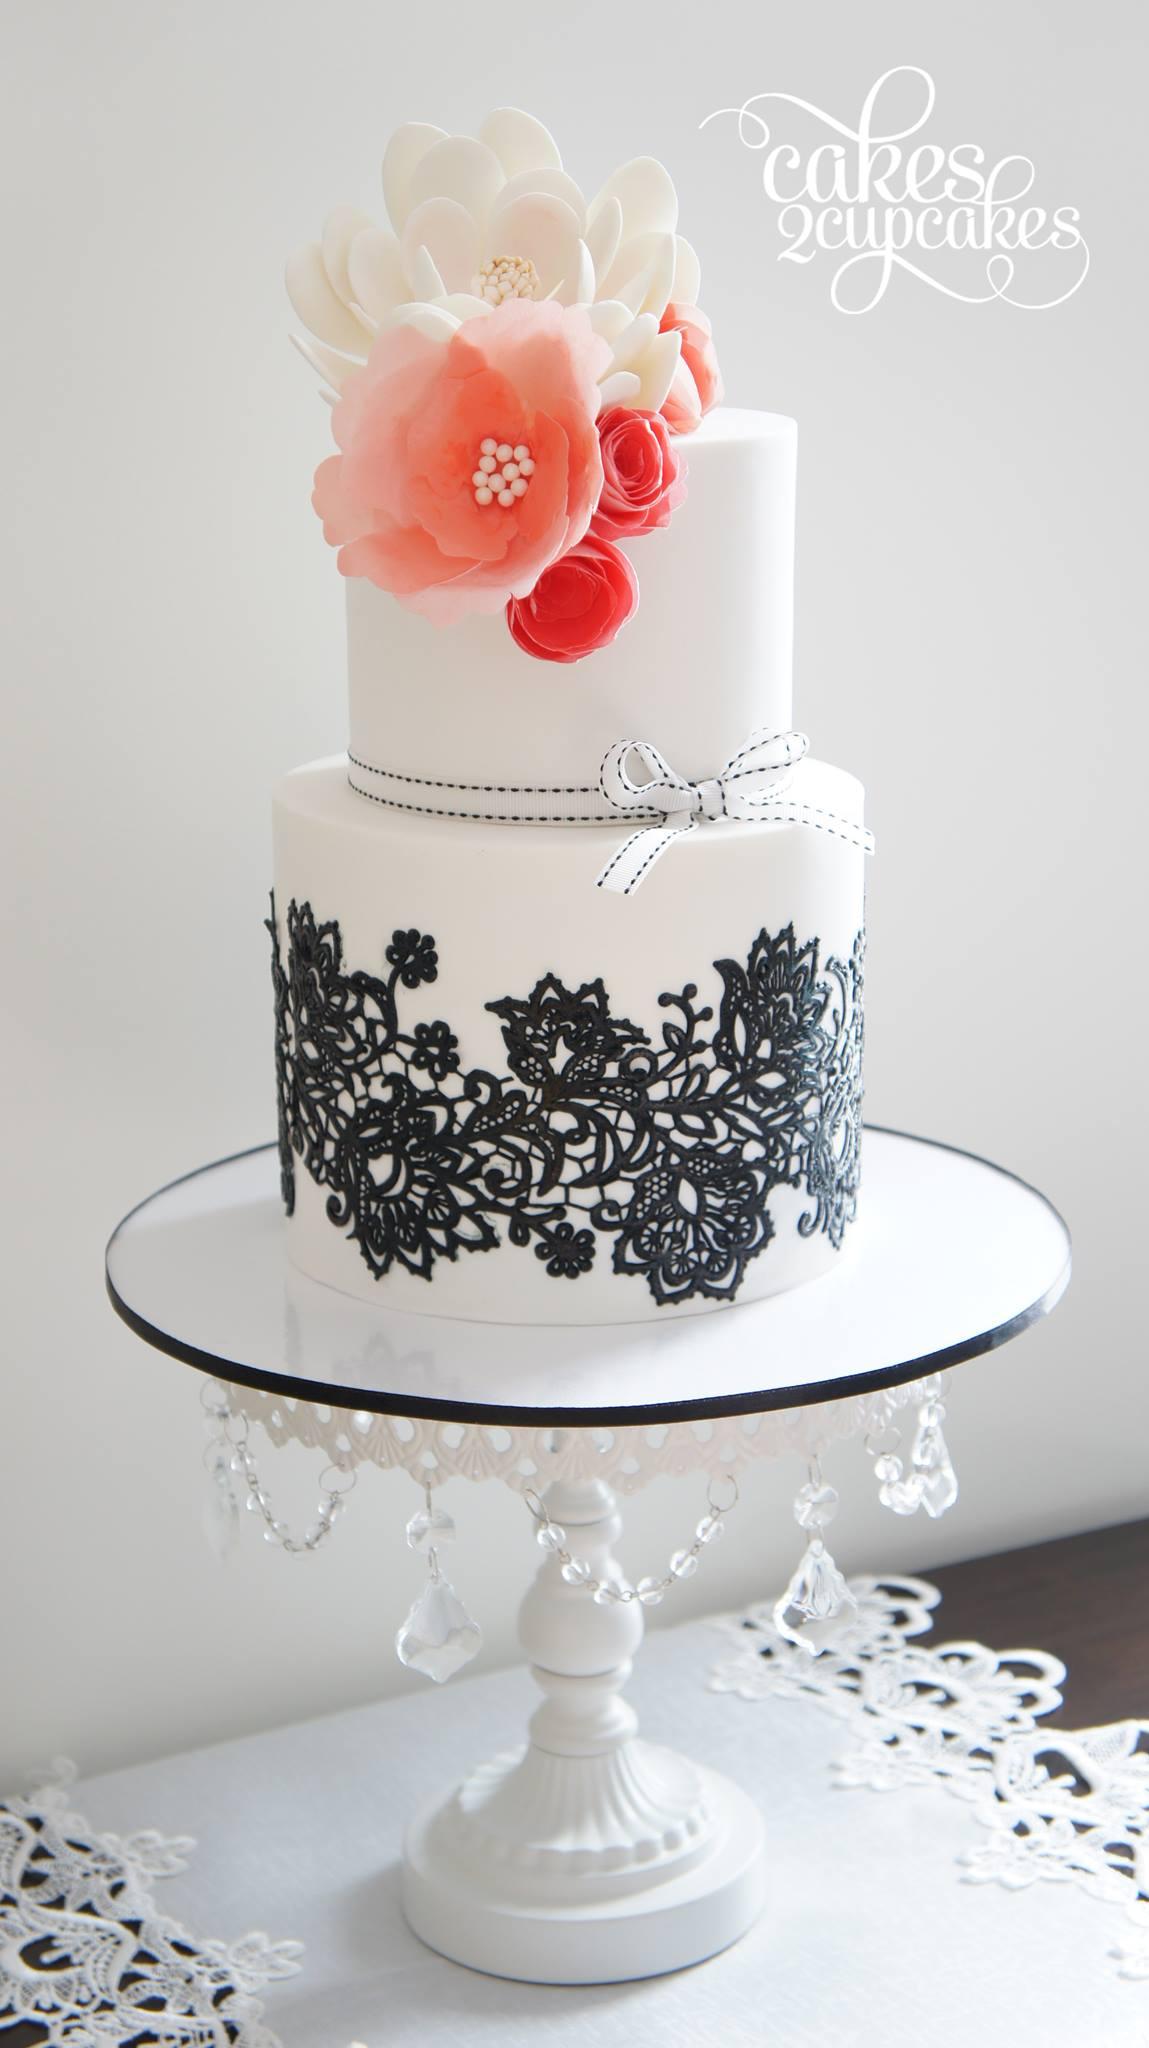 white-cakestand-opulenttreasures-cakes2cupcakes.jpg